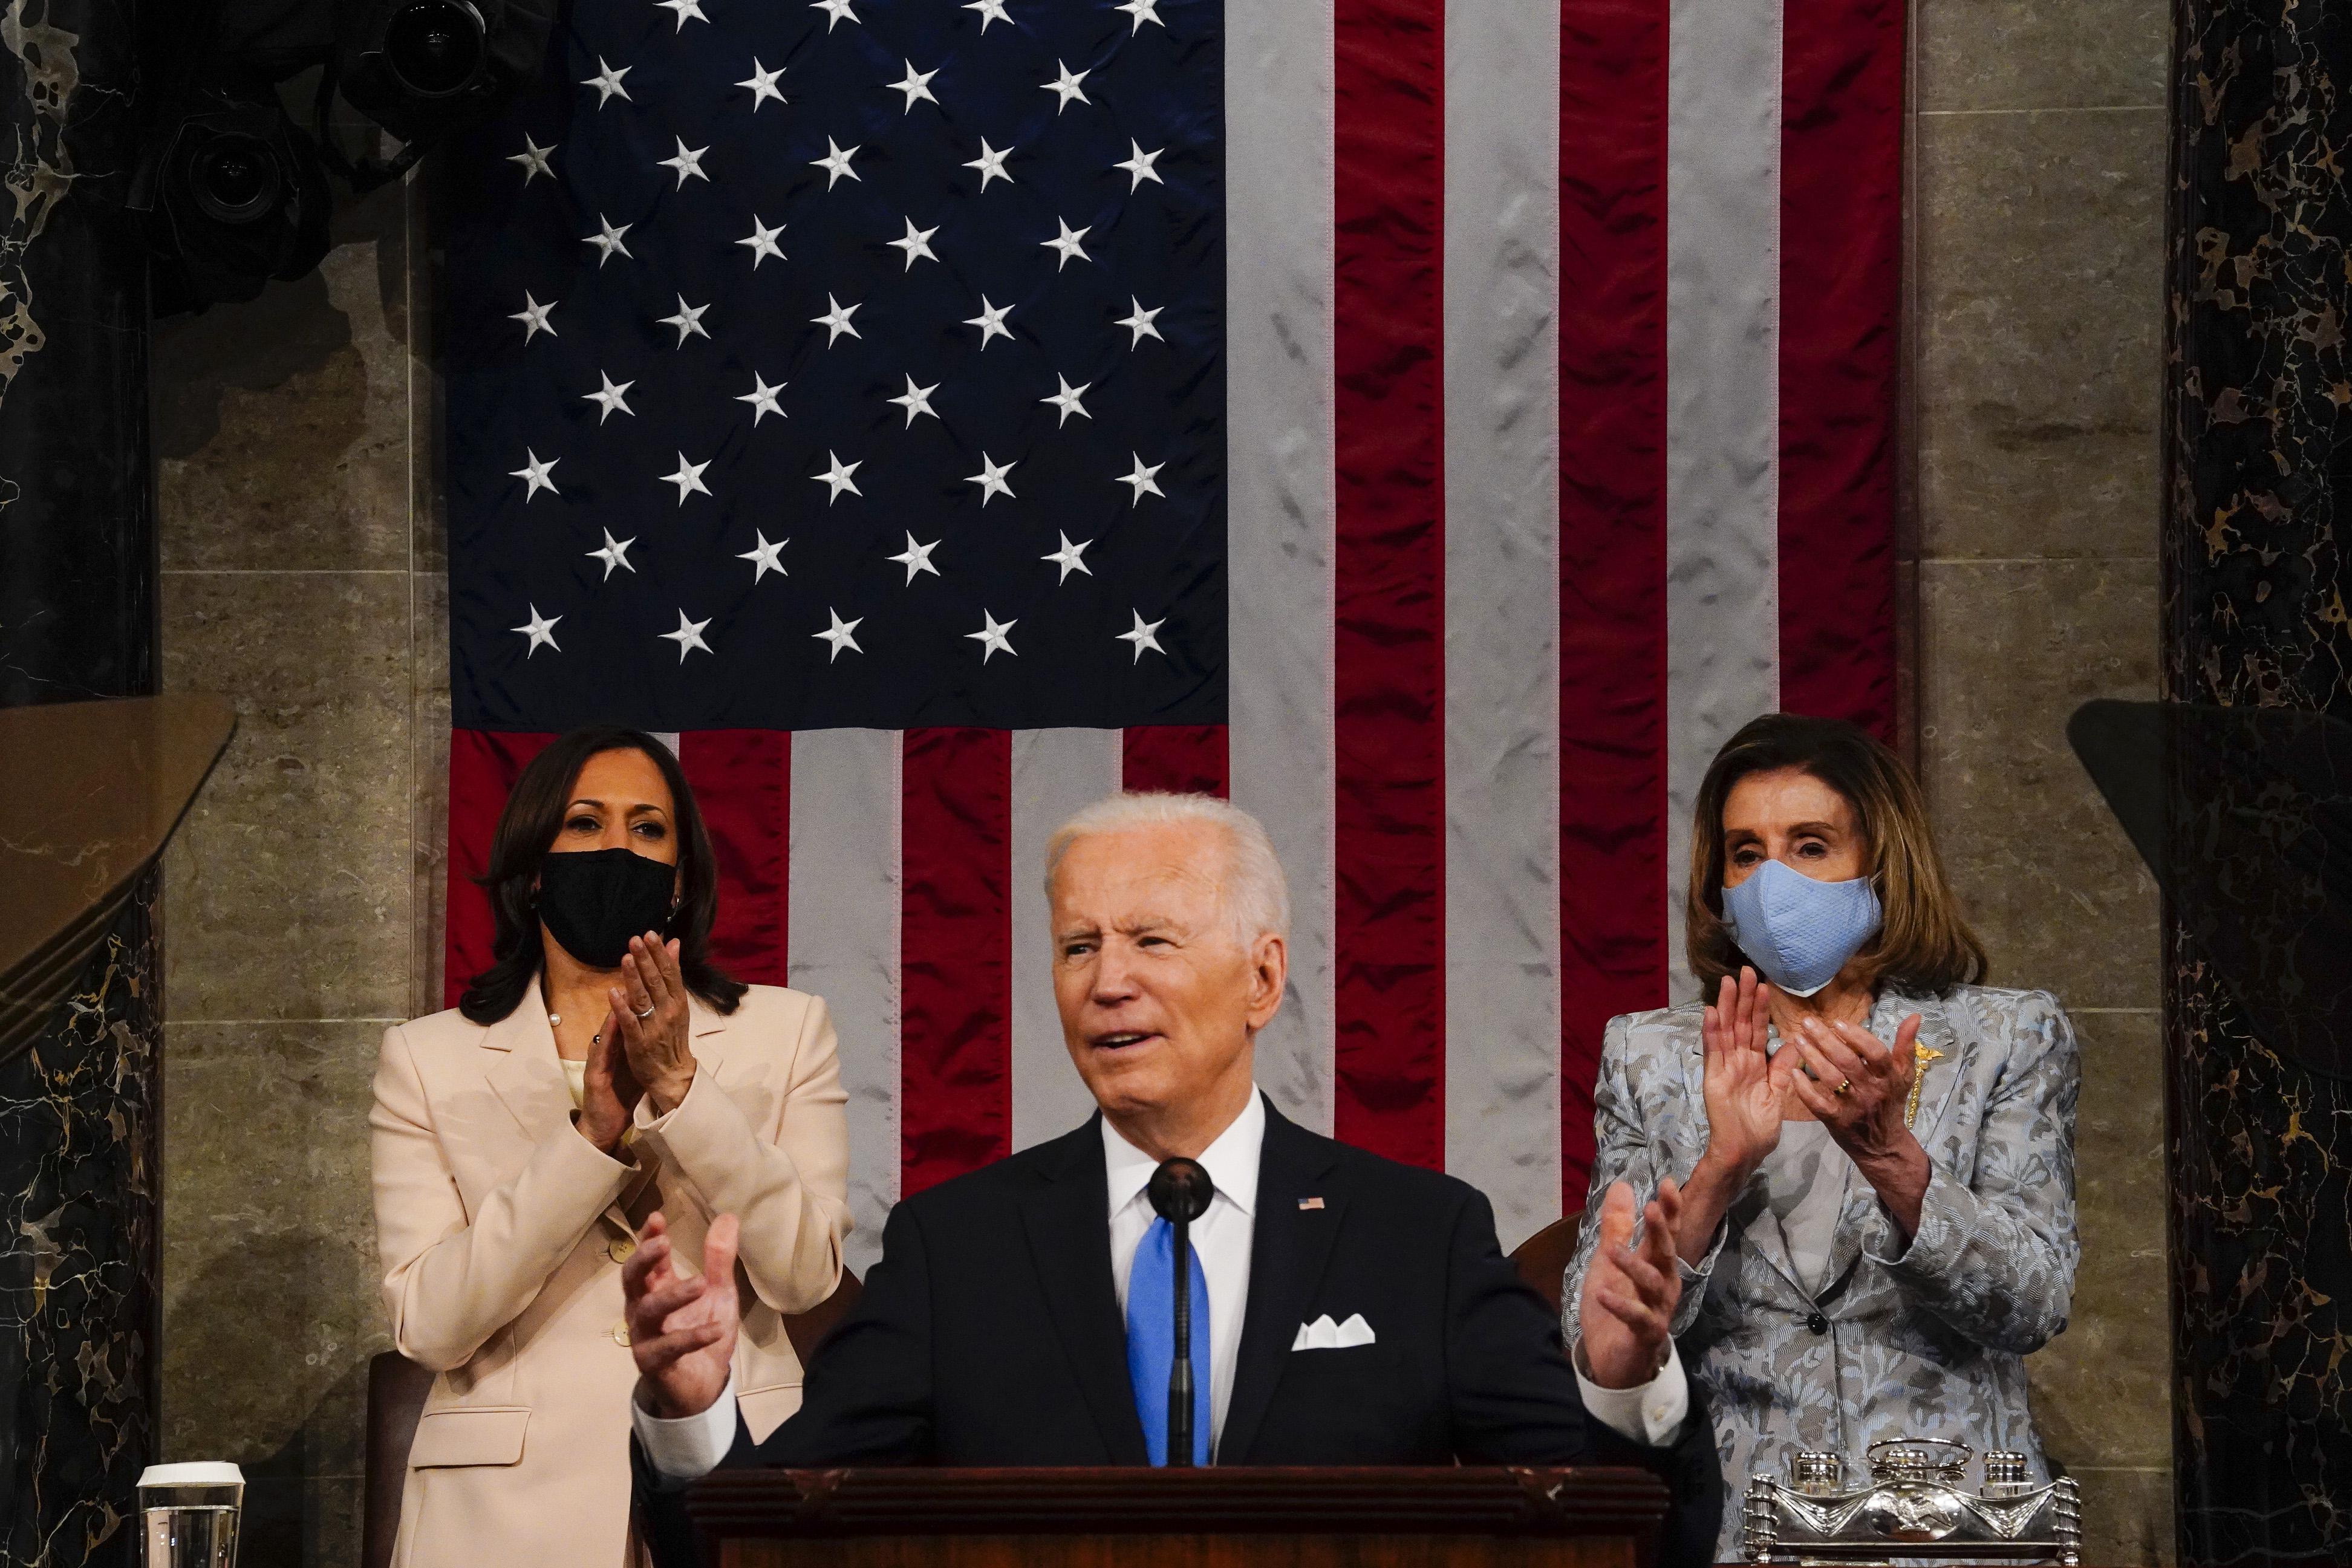 Kamala Harris and Nancy Pelosi make Biden's address a historic moment